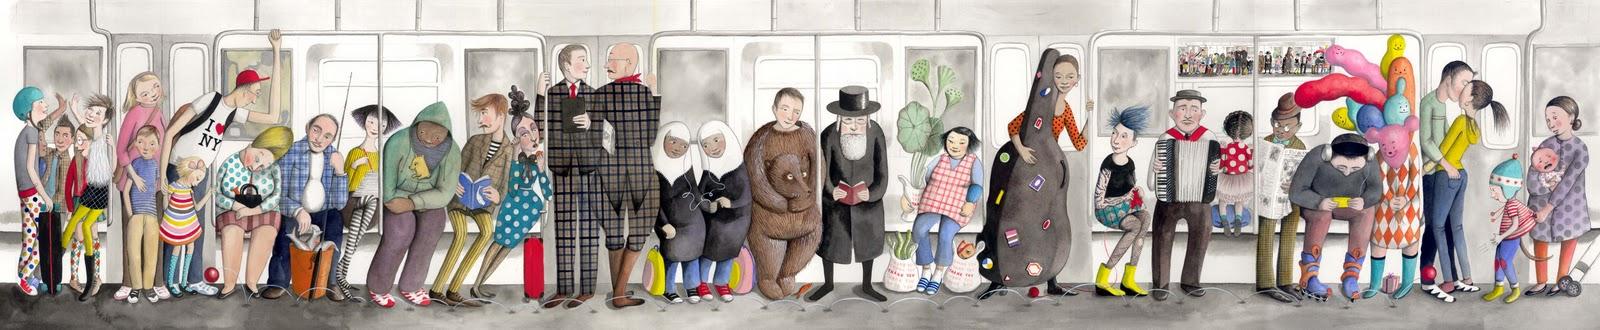 Sophie Blackall_Subway Art